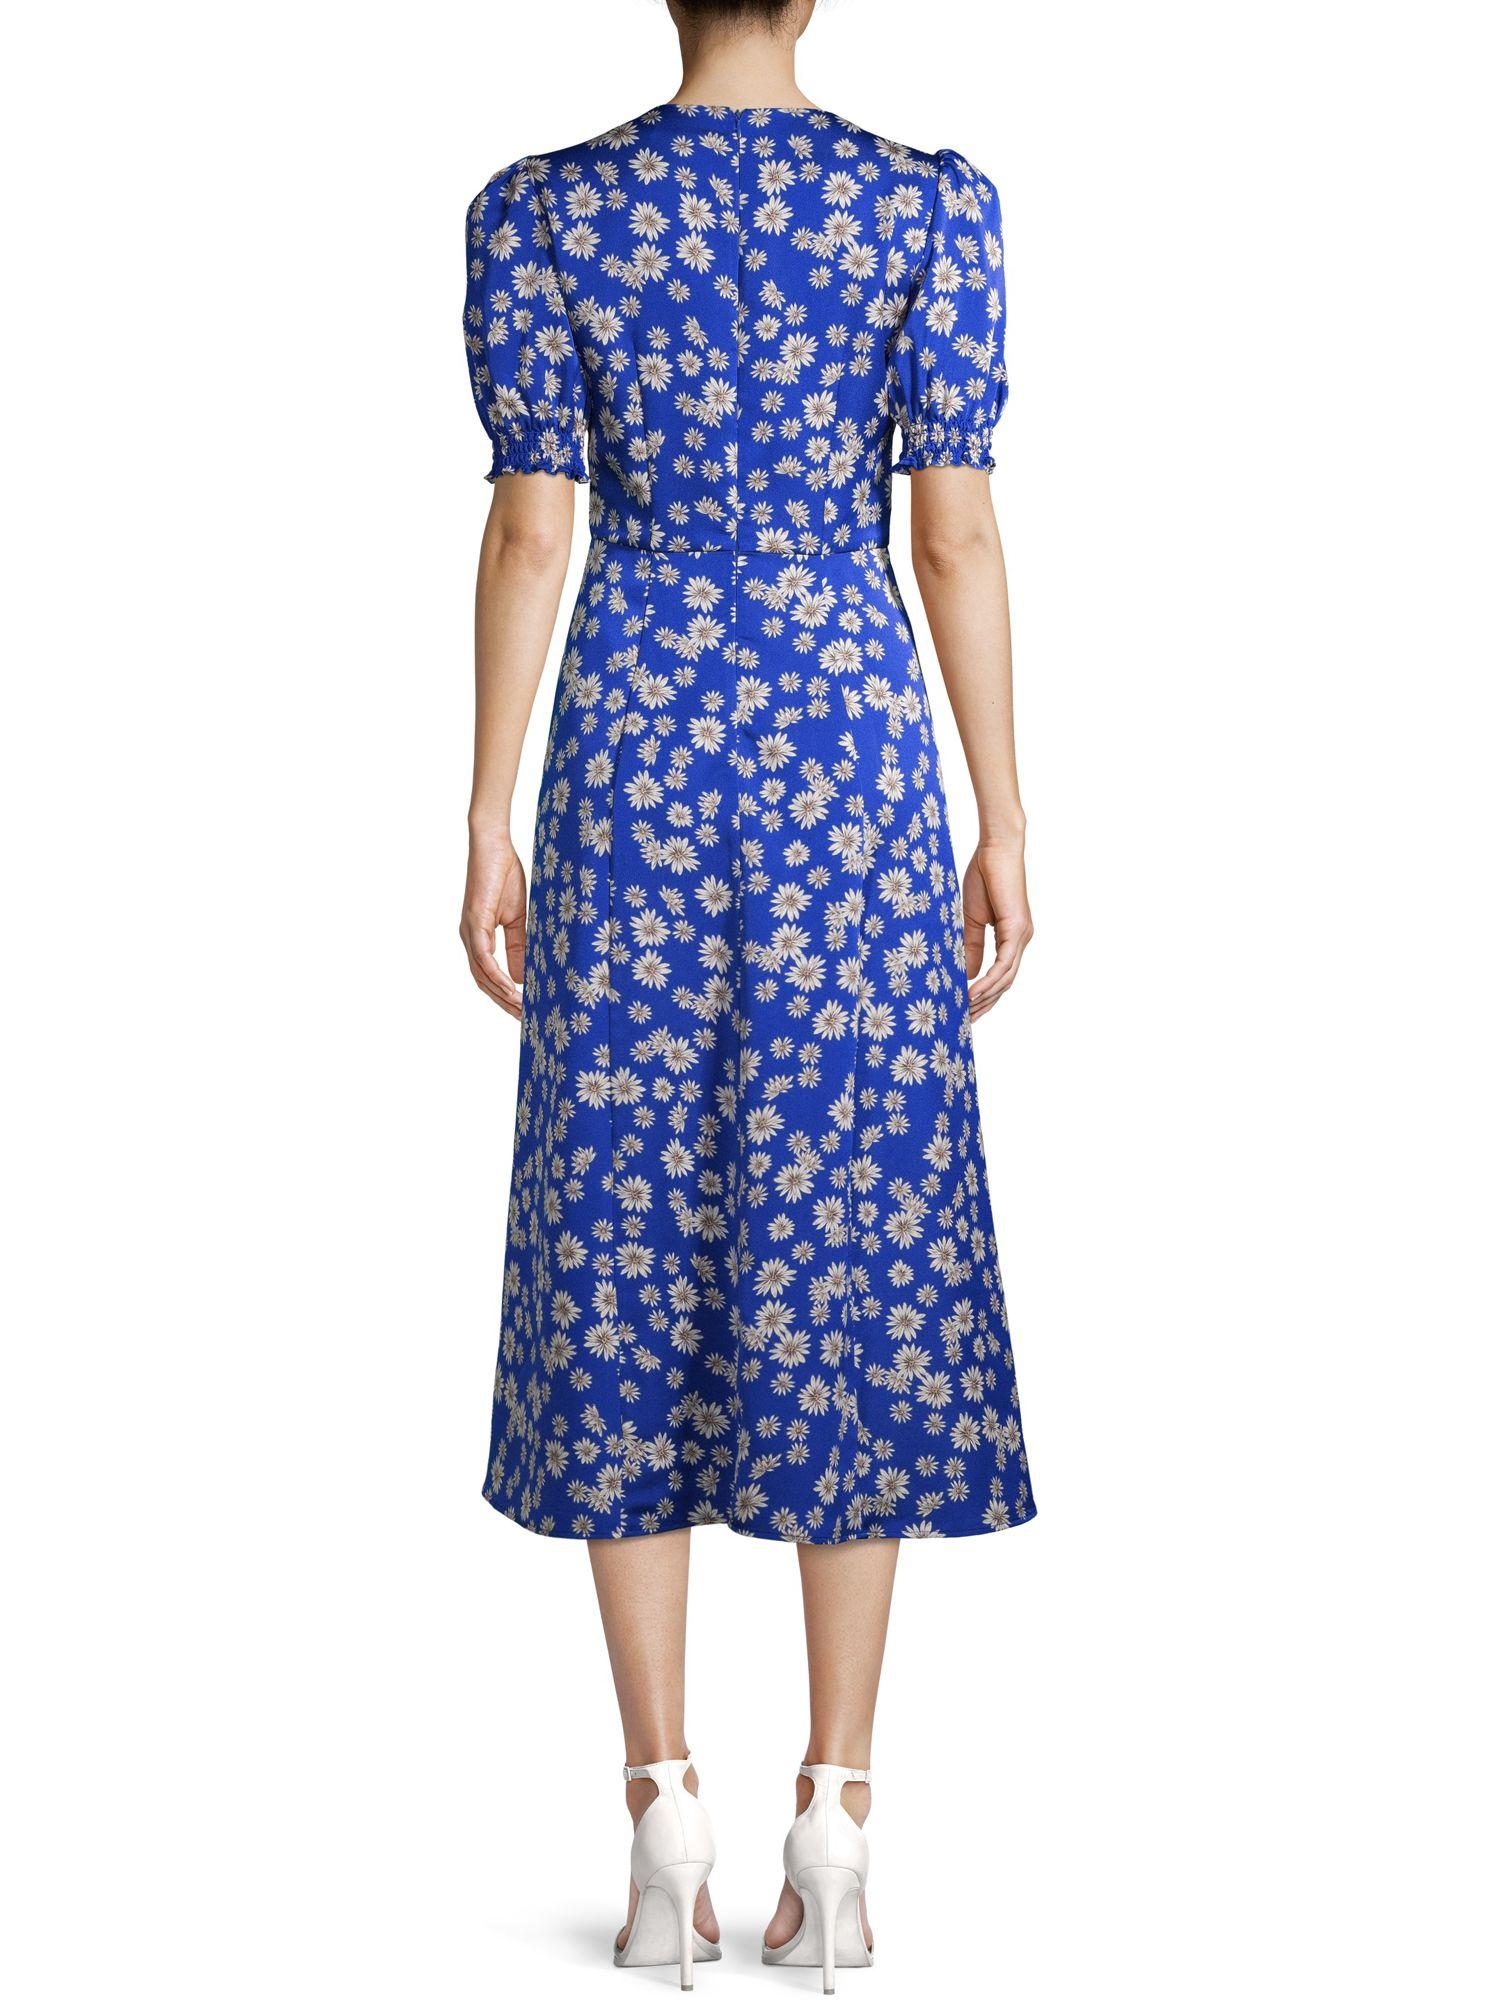 Prospect The Label Prospect The Label Women S Bustier Midi Dress Walmart Com Dresses Midi Dress Bustier [ 2000 x 1500 Pixel ]